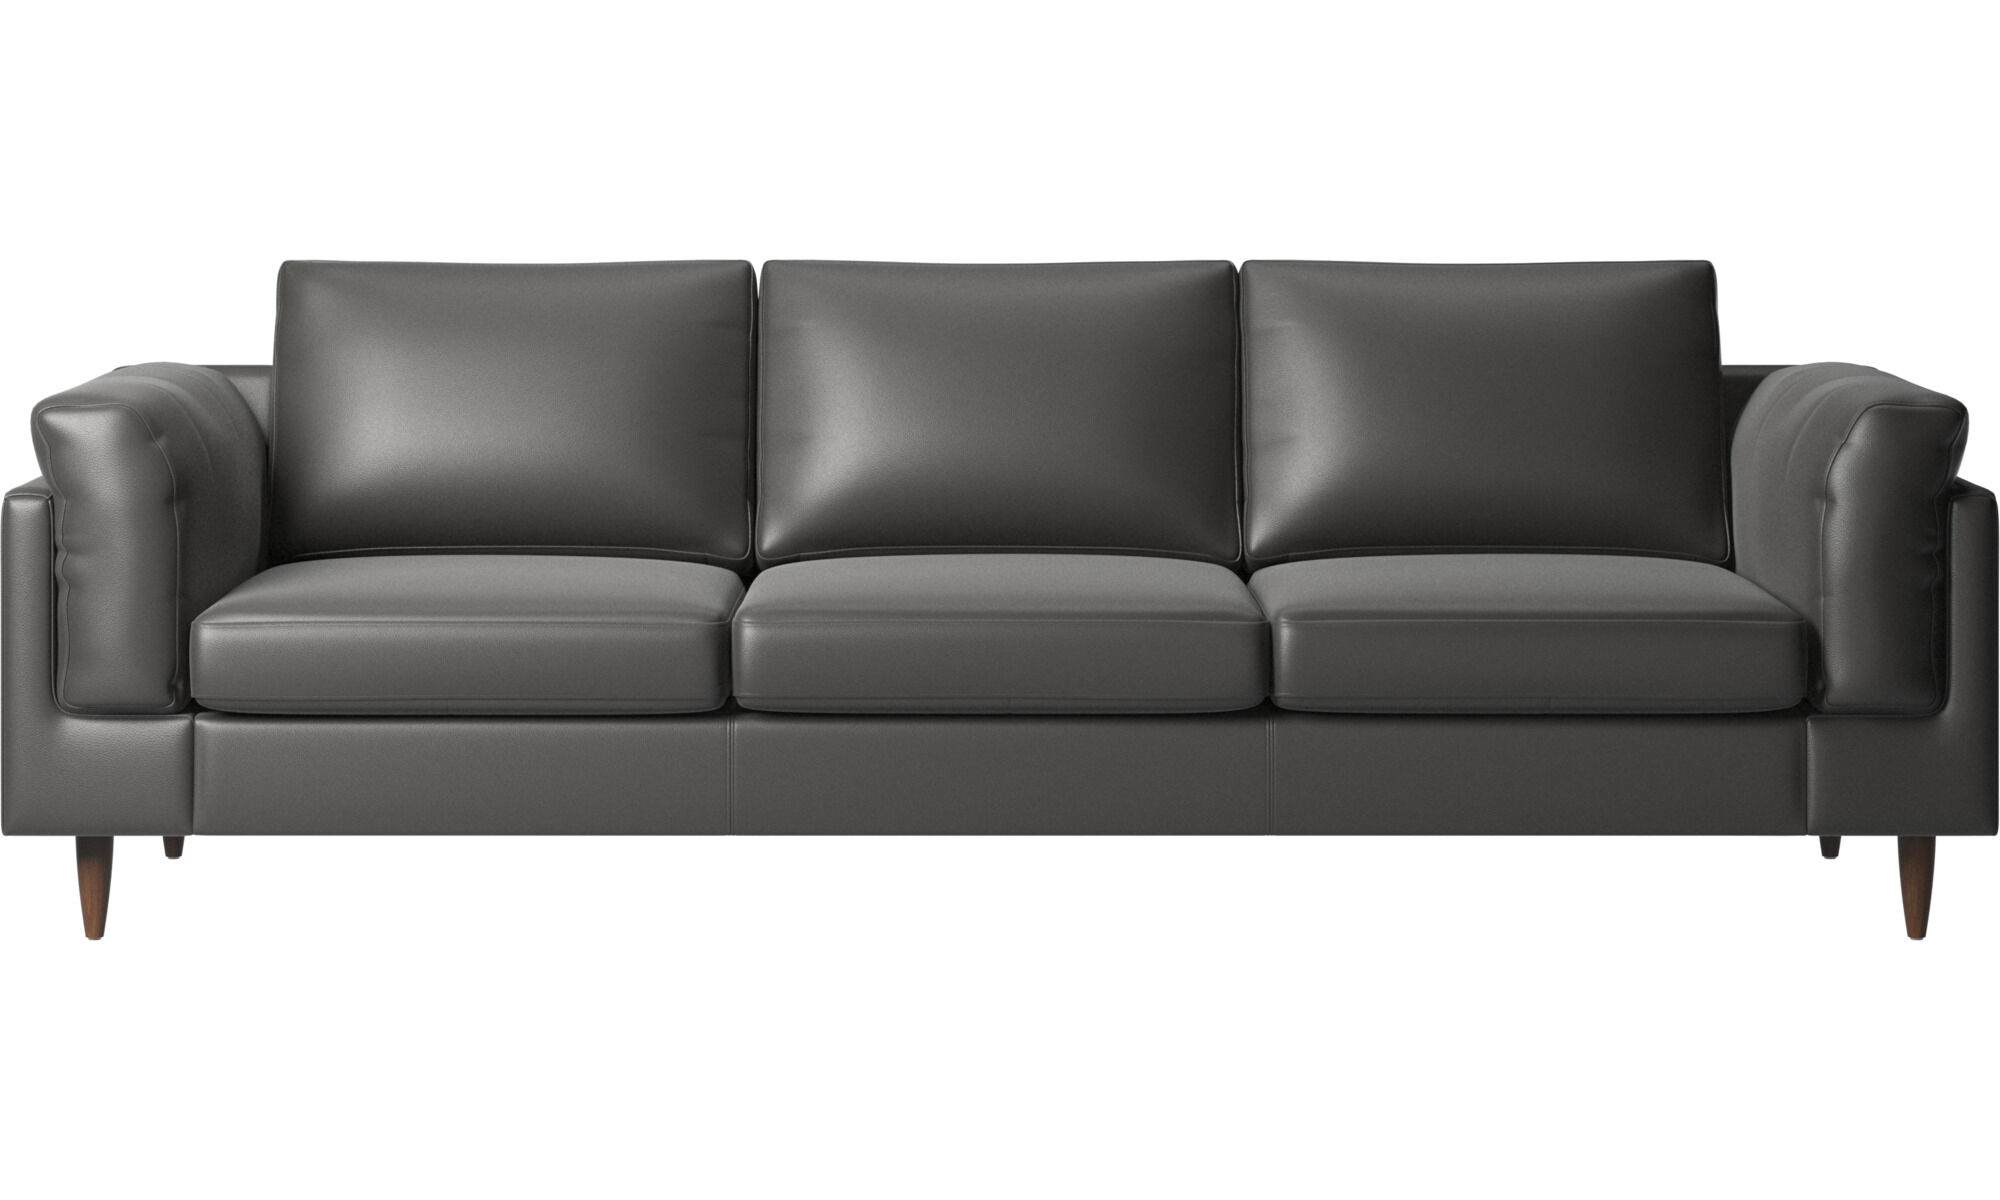 3 Seater Sofas   Indivi 2 Sofa   Gray   Leather